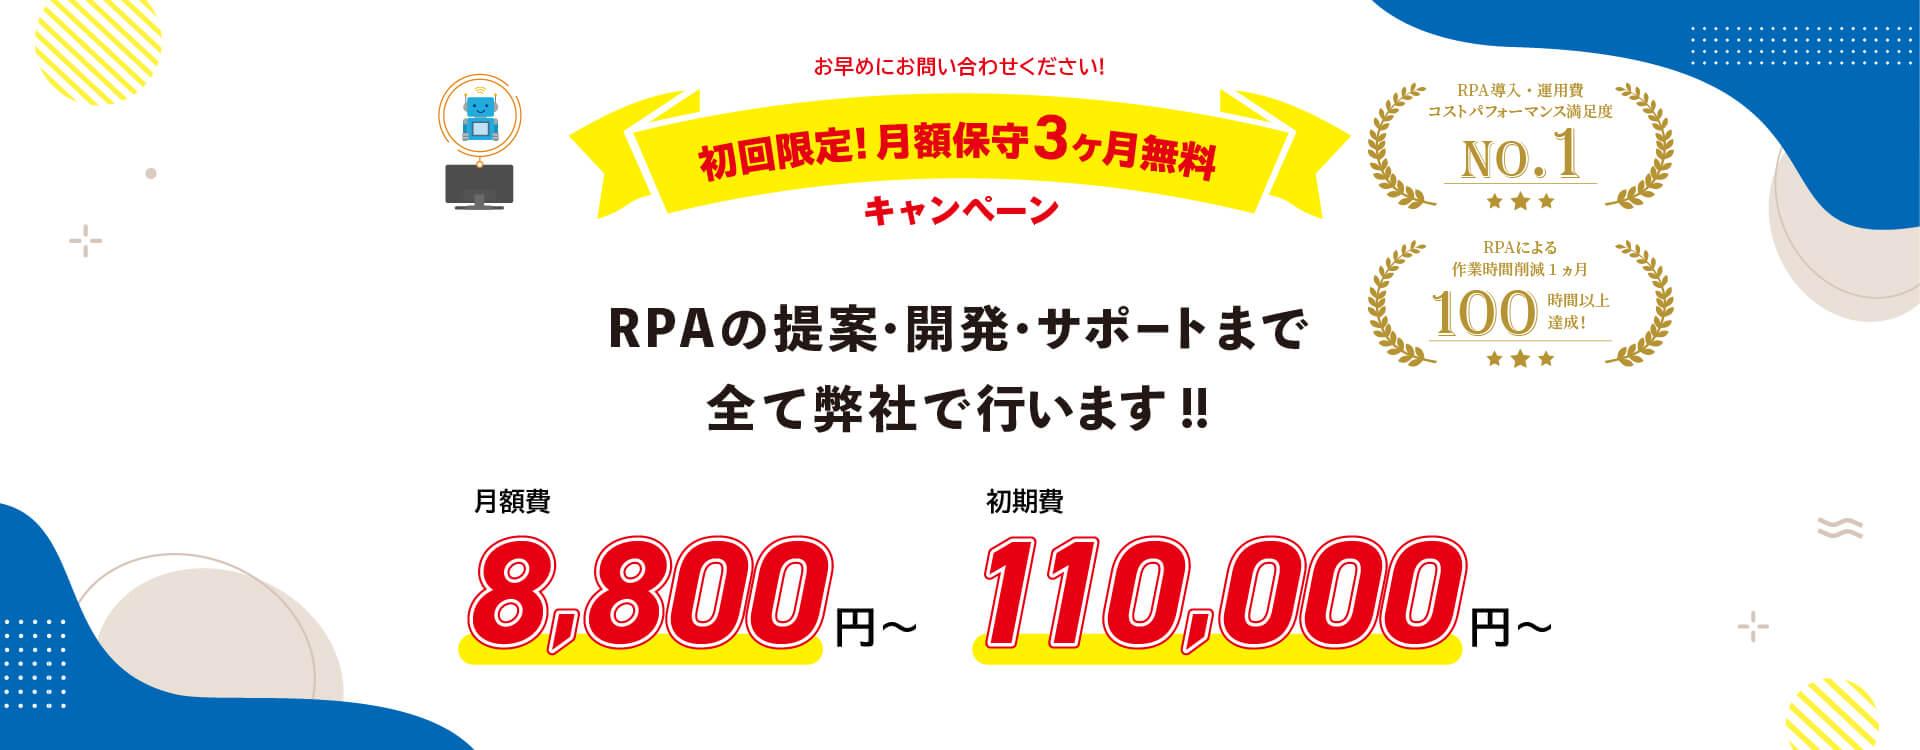 RPA導入費は高くない。貴社のPC作業。自動化できれば、もっとクリエイティブな環境を作れます。RPA導入・運用費コストパフォーマンス満足度No.1|RPAによる作業時間削減1ヵ月100時間以上達成!